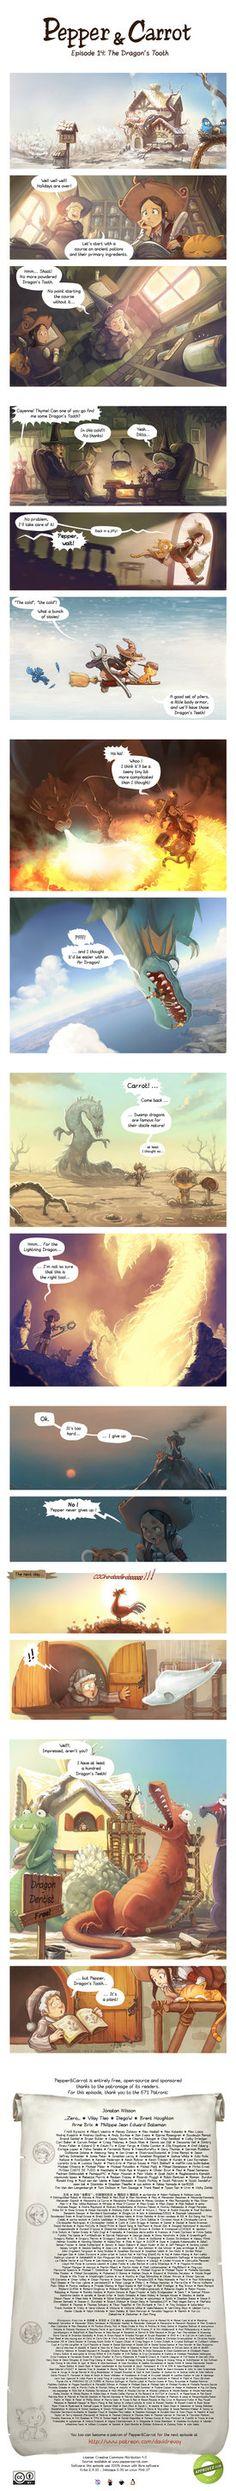 Episode 14 : The Dragon's Tooth by Deevad.deviantart.com on @DeviantArt